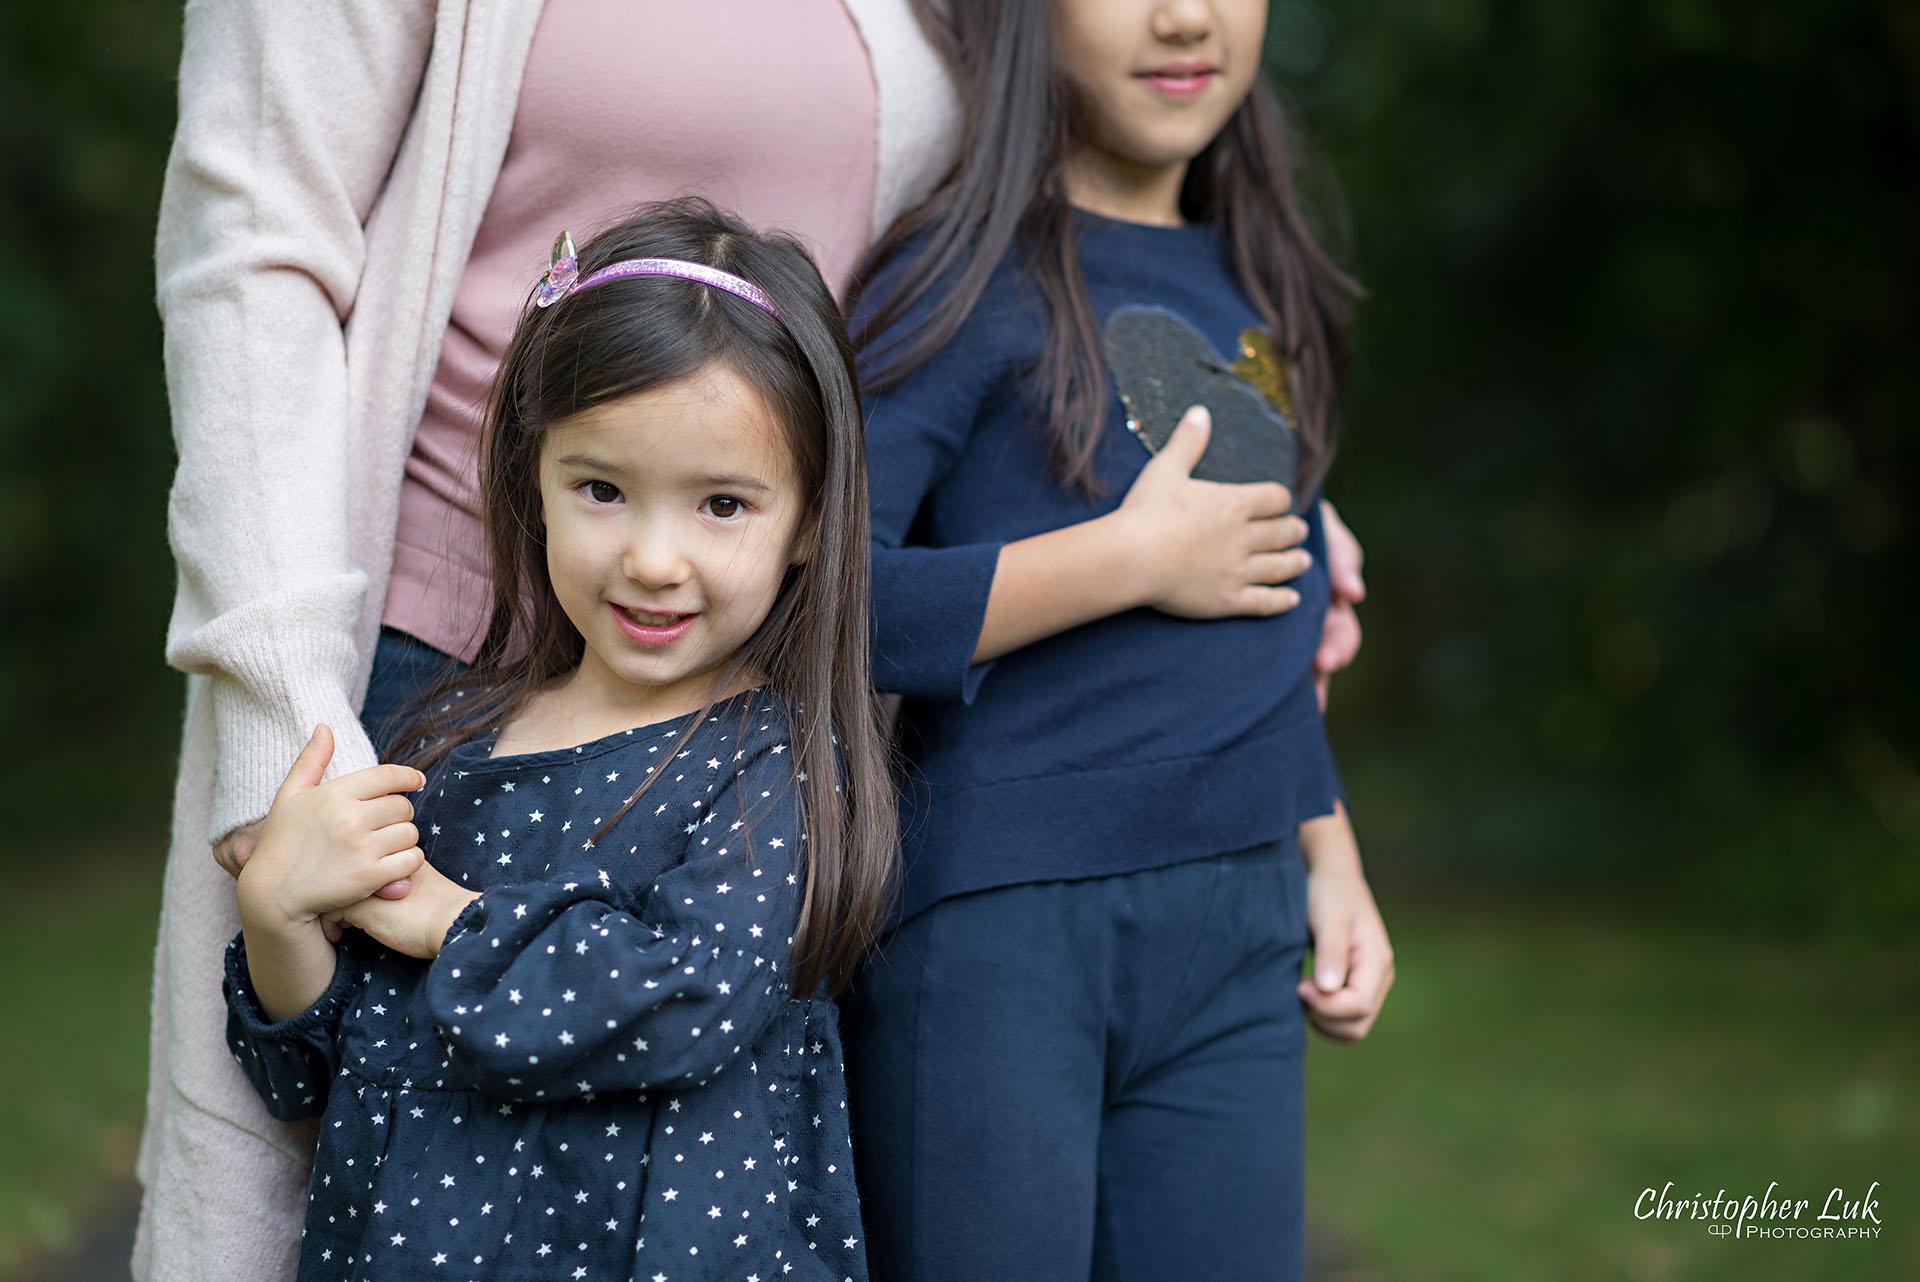 Christopher Luk Family Photographer Toronto Markham Candid Natural Photojournalistic Mother Daughter Sisters Sisterhood Smile